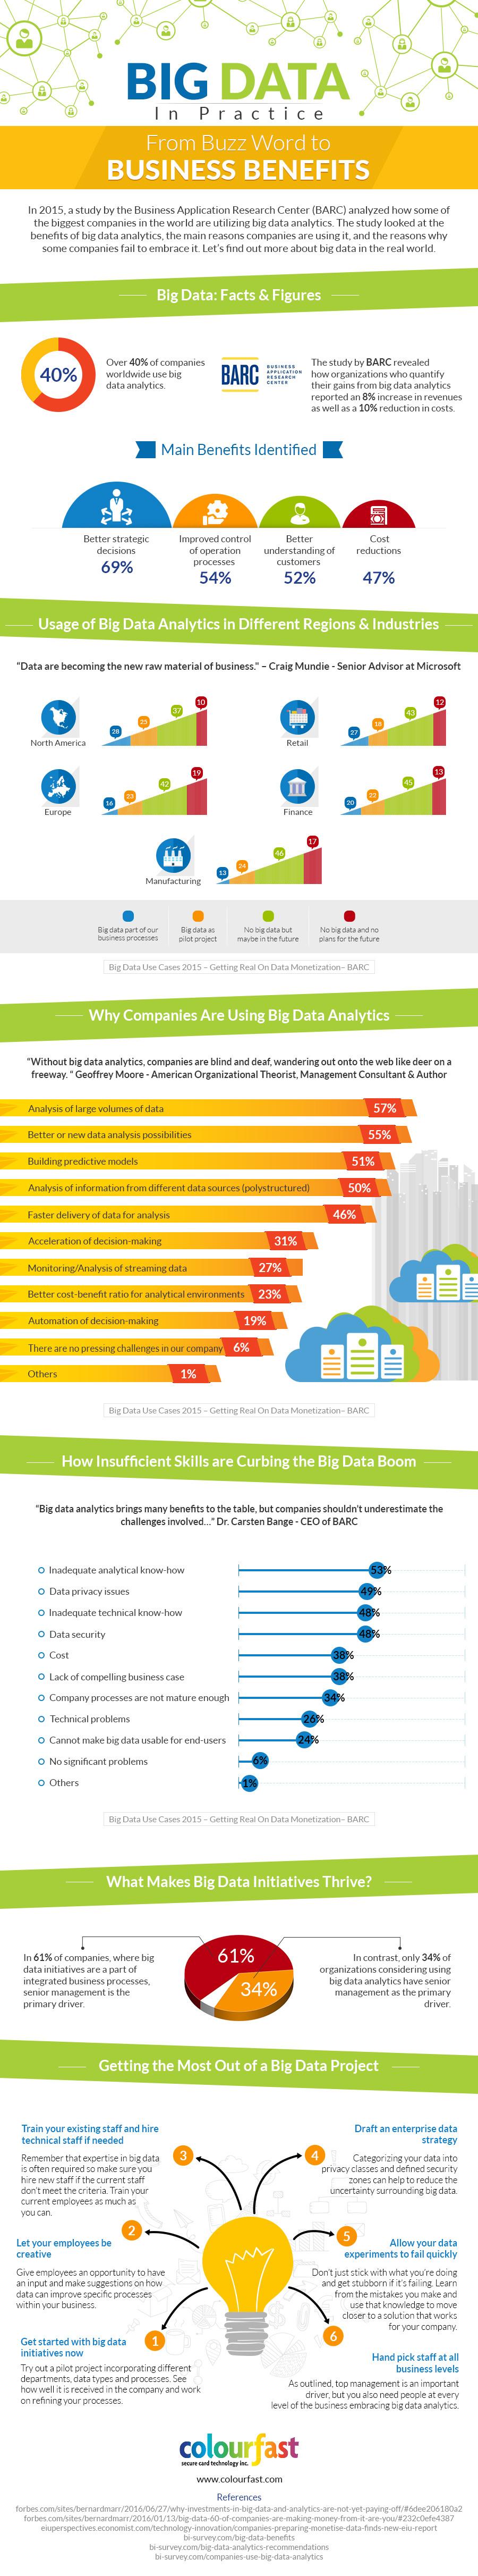 Big Data 2017 In Practice [Infographic]